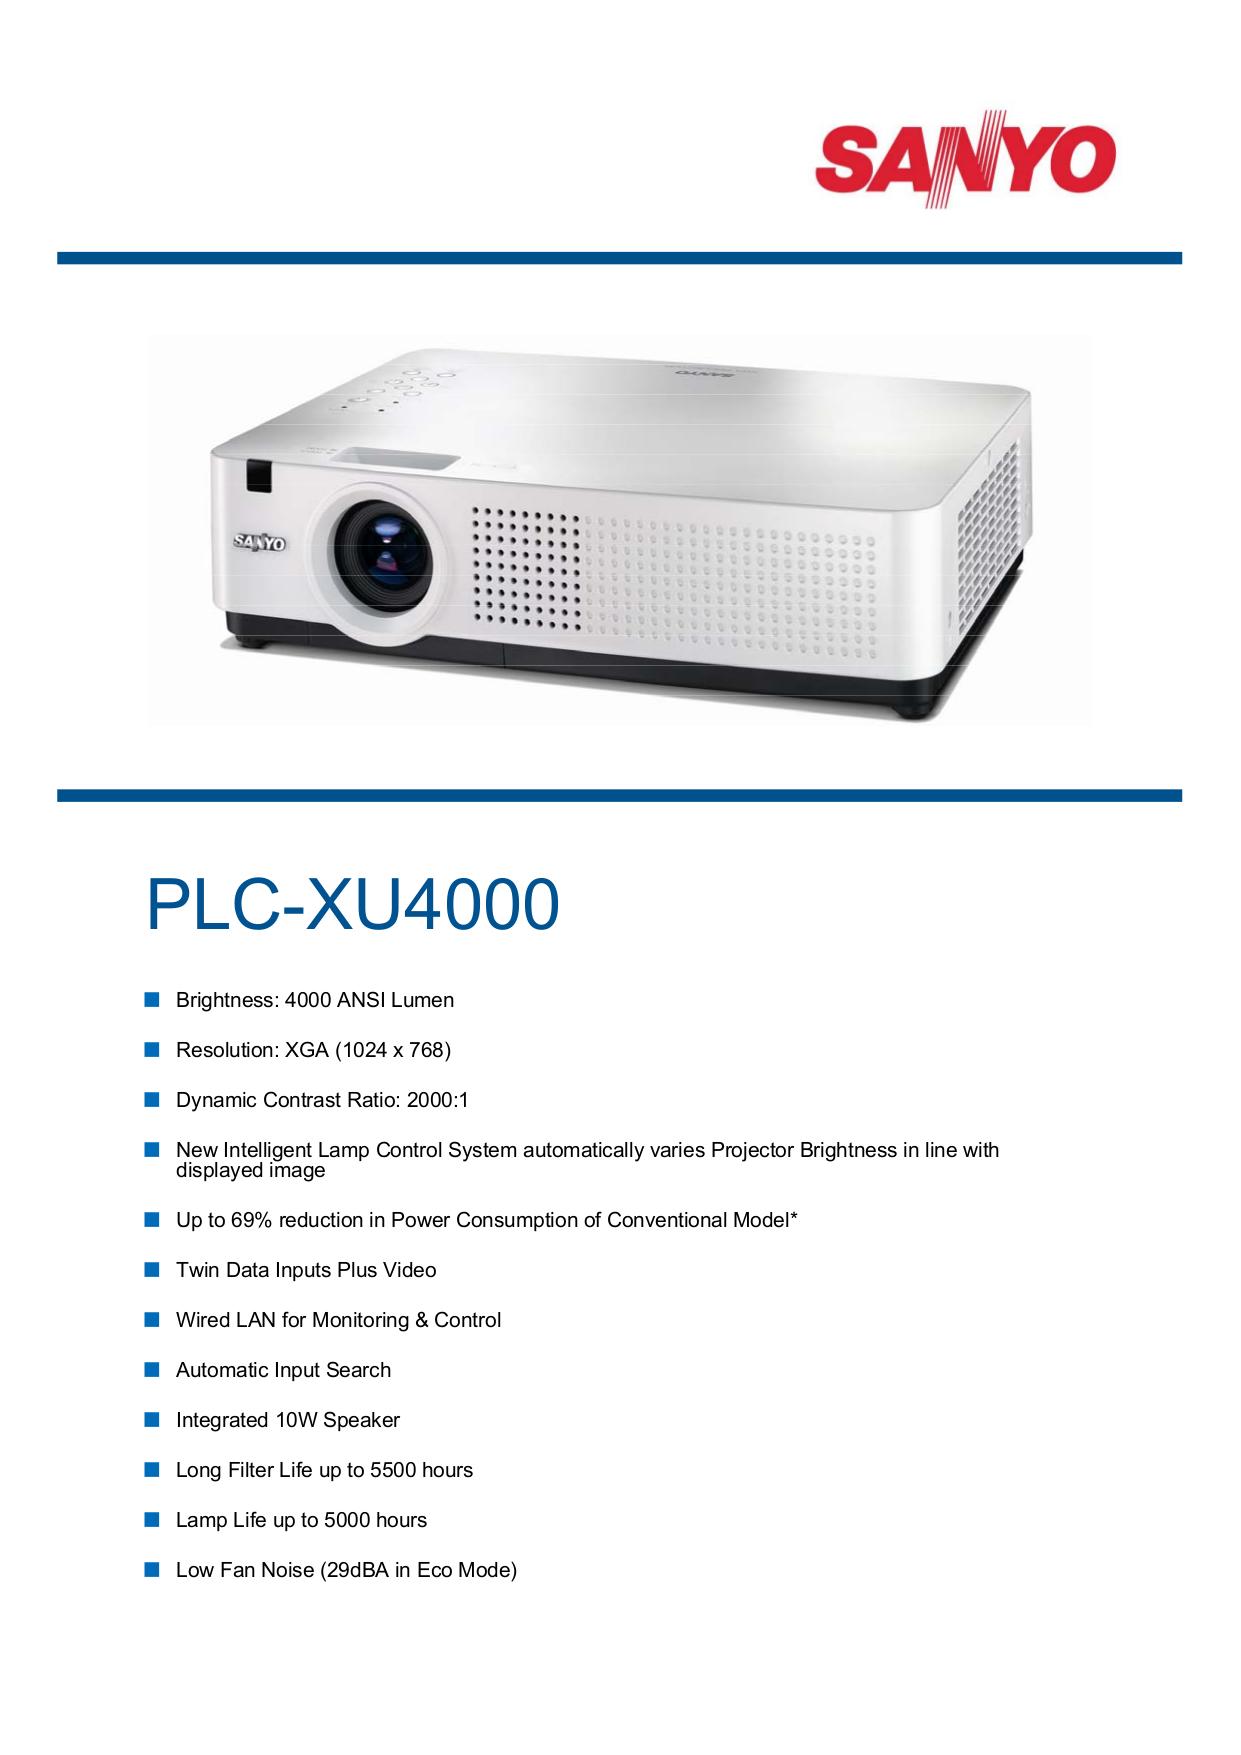 sanyo projector manual rh sanyo projector manual tempower us sanyo plc-xp200l user manual